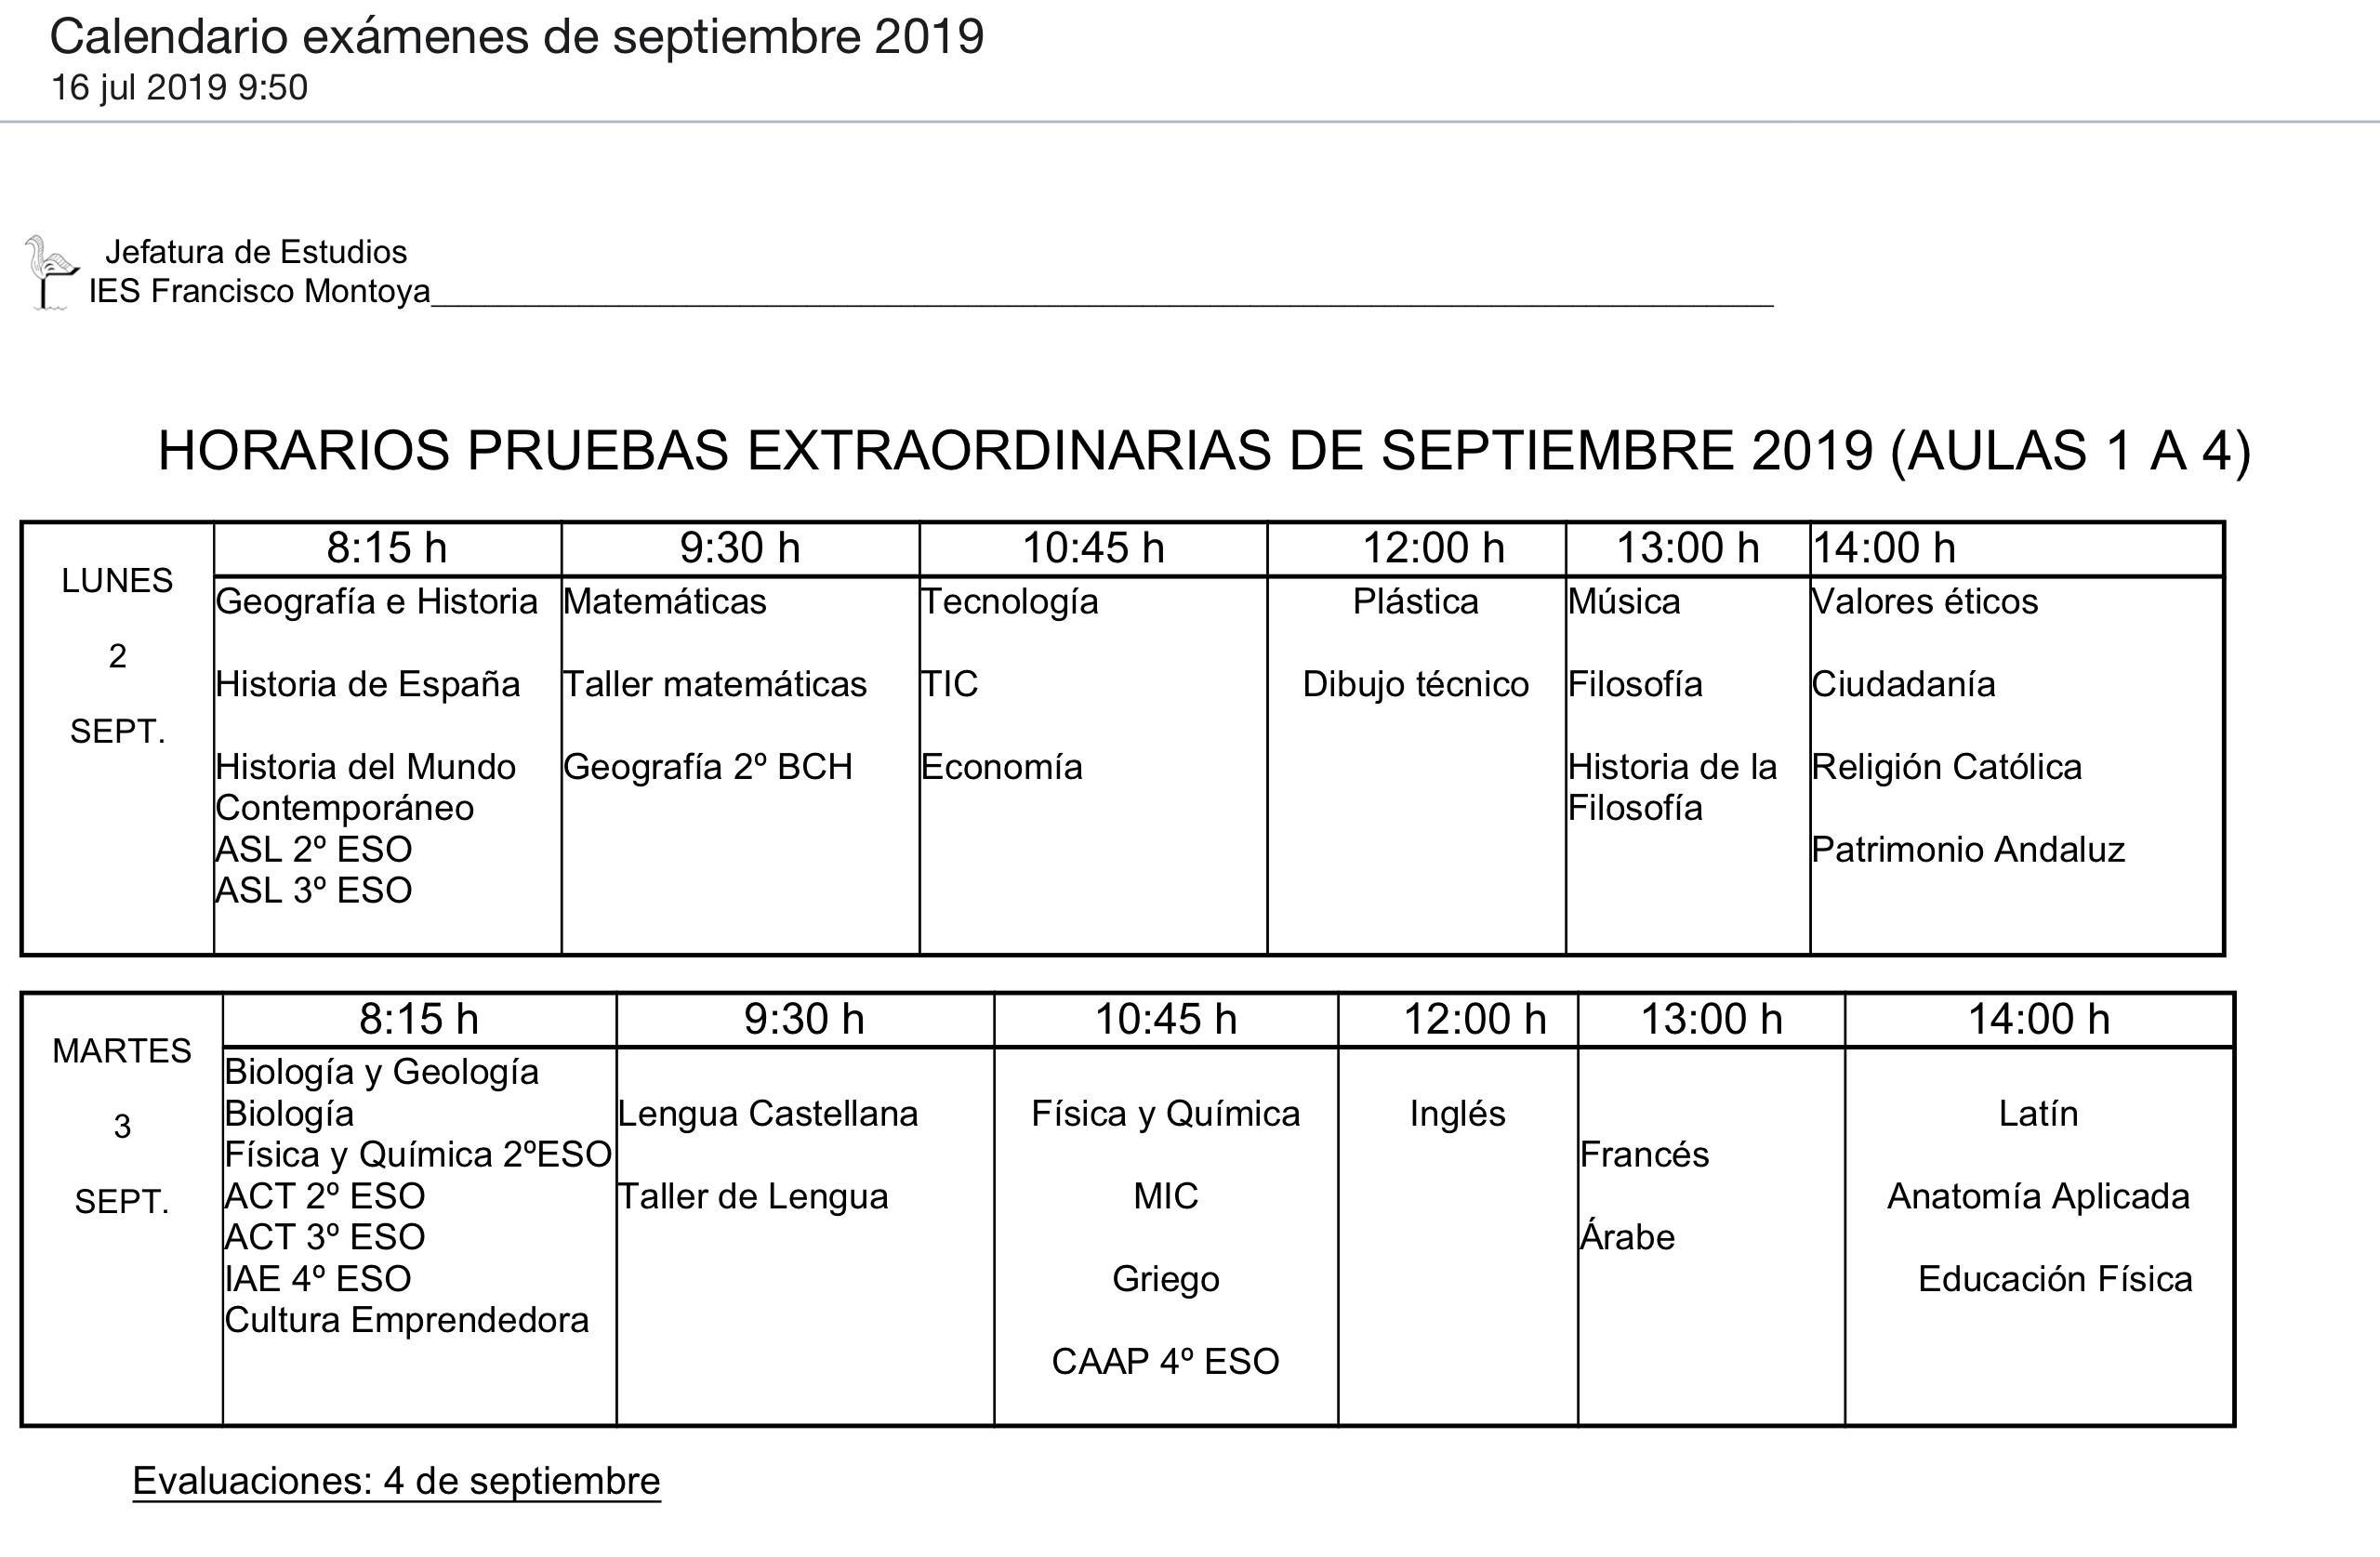 Calendario de exámenes de septiembre (2019)